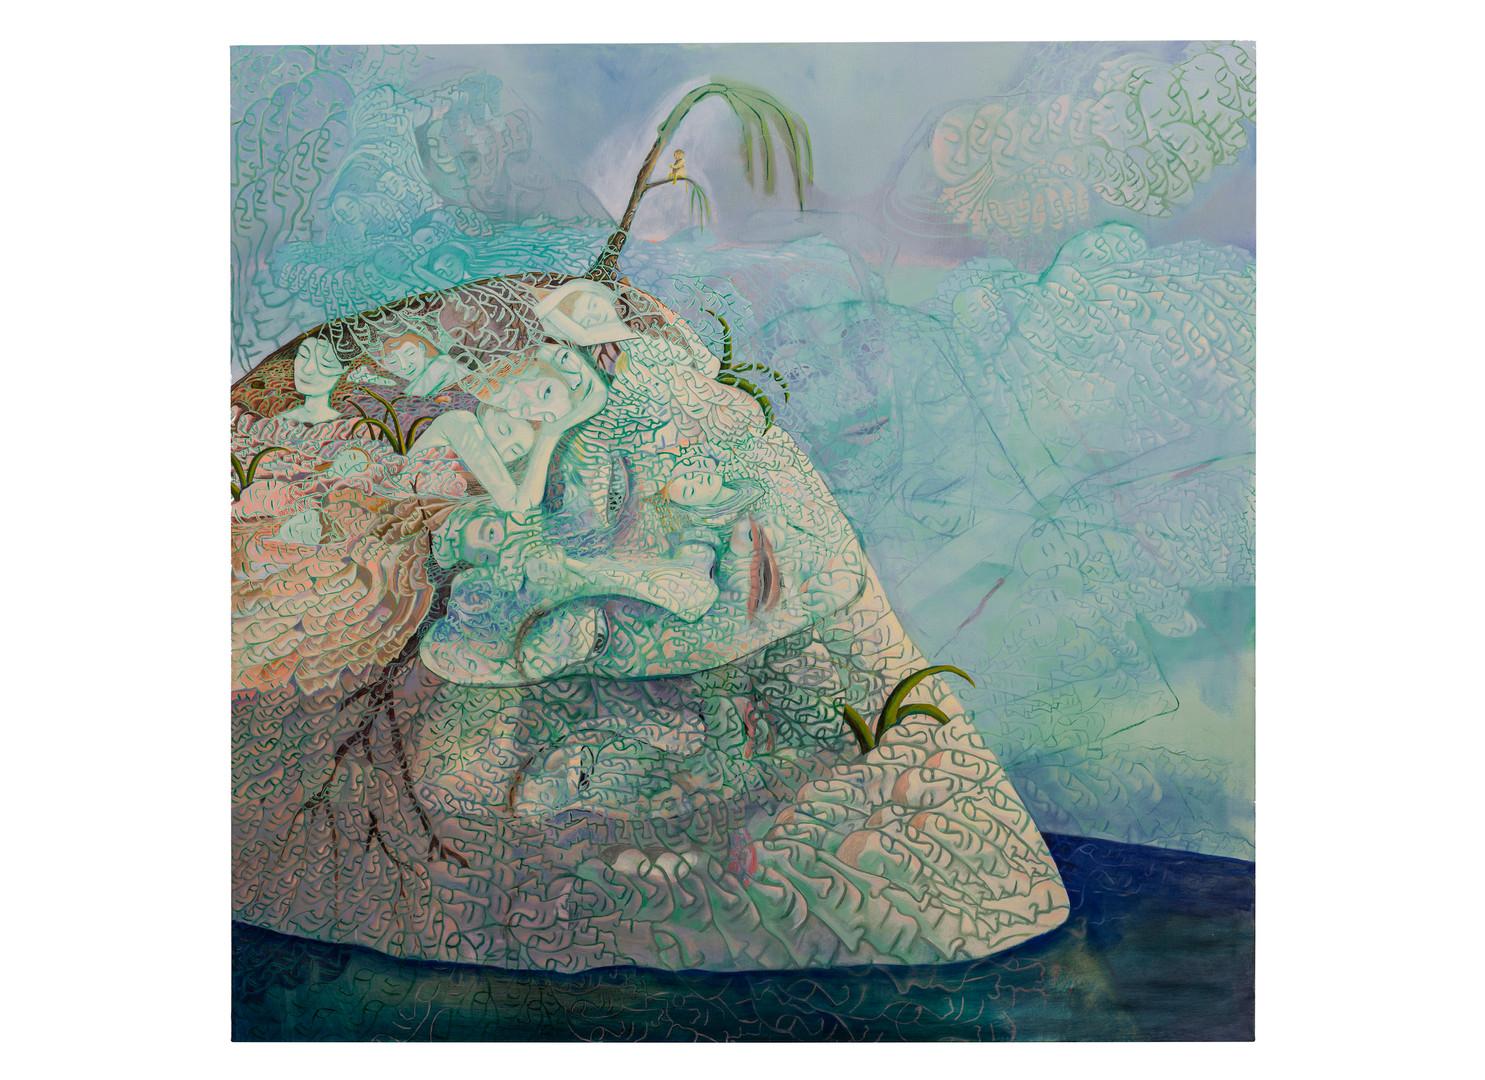 Marlene Steyn | islet of eyelids | 2020 | Oil on Canvas | 190.5 x 190.5 cm